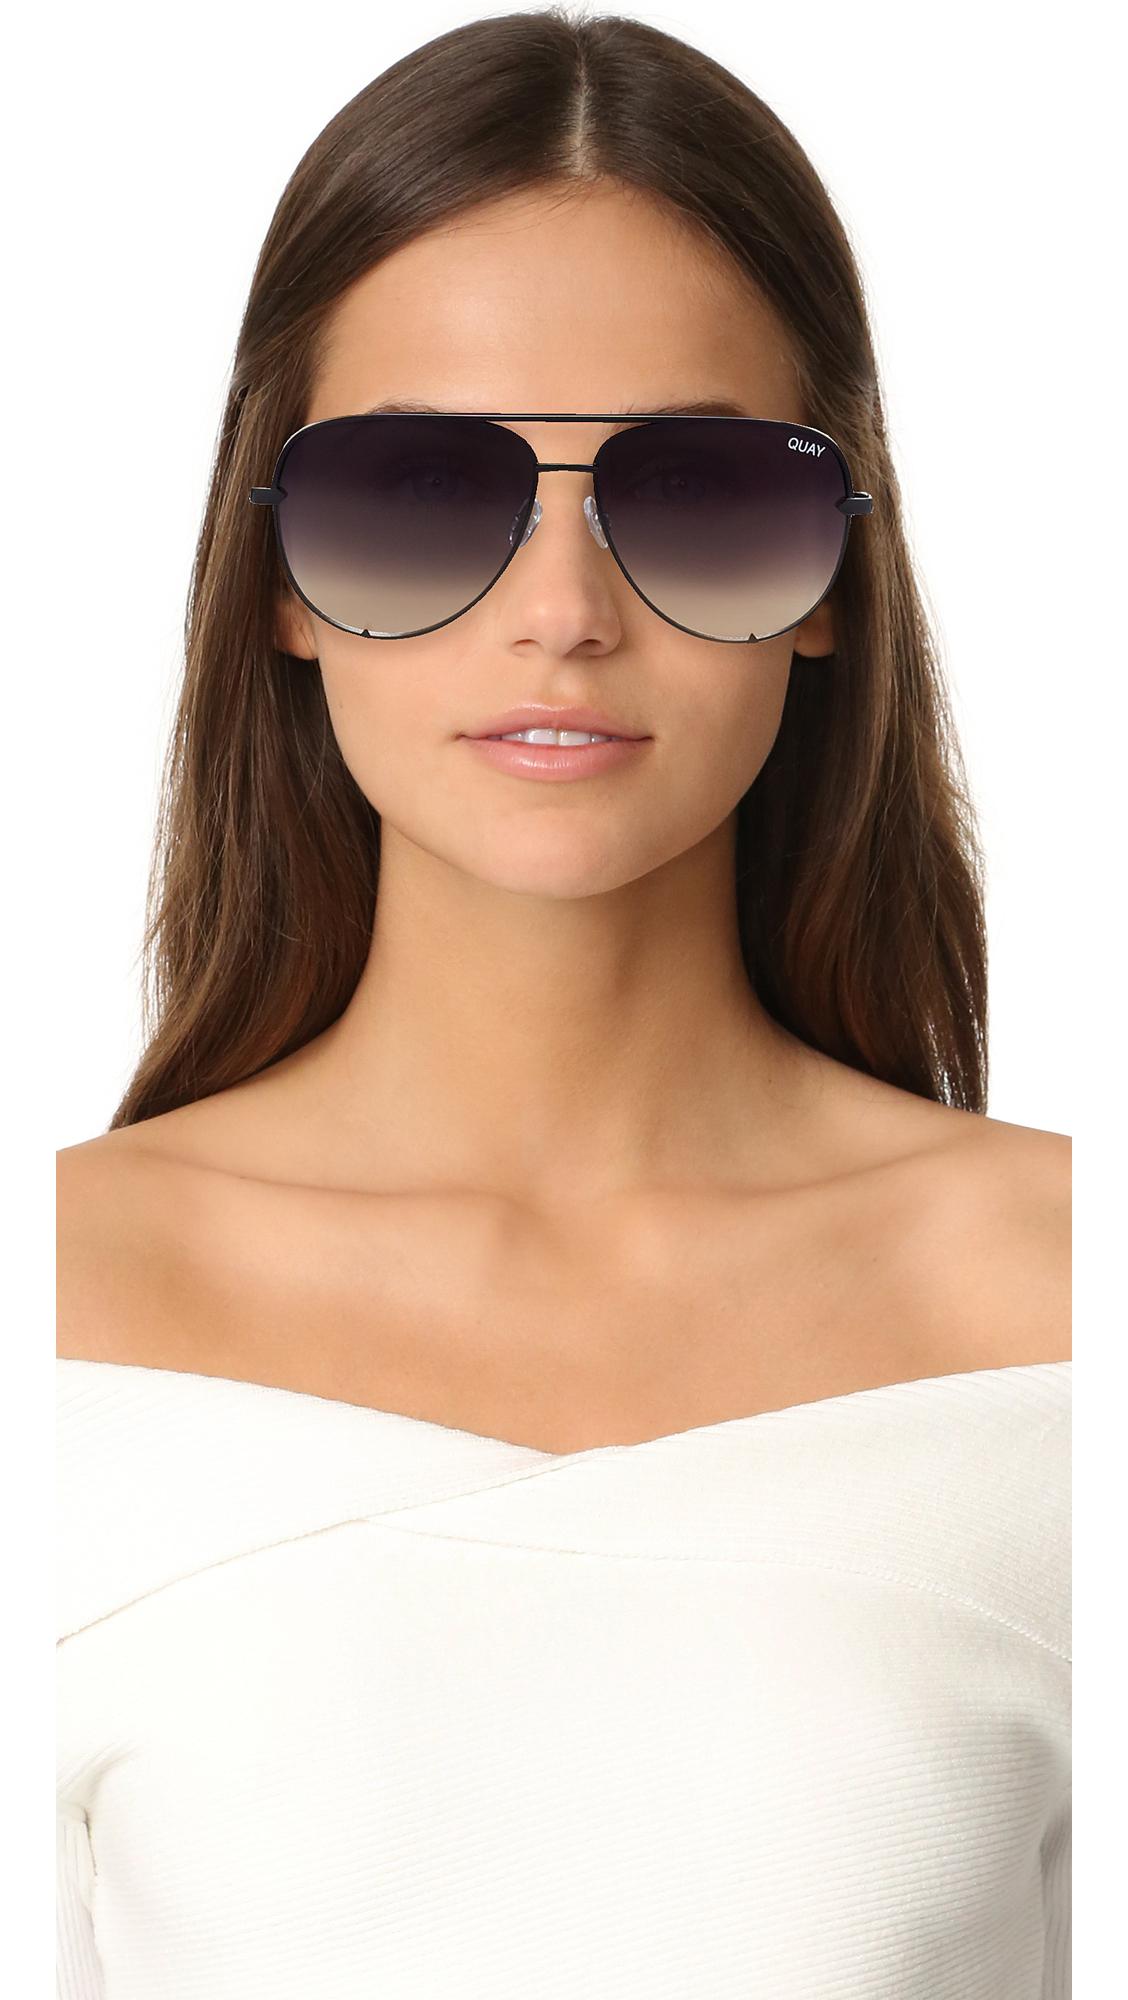 04dea527600d Quay x Desi Perkins High Key Sunglasses | SHOPBOP